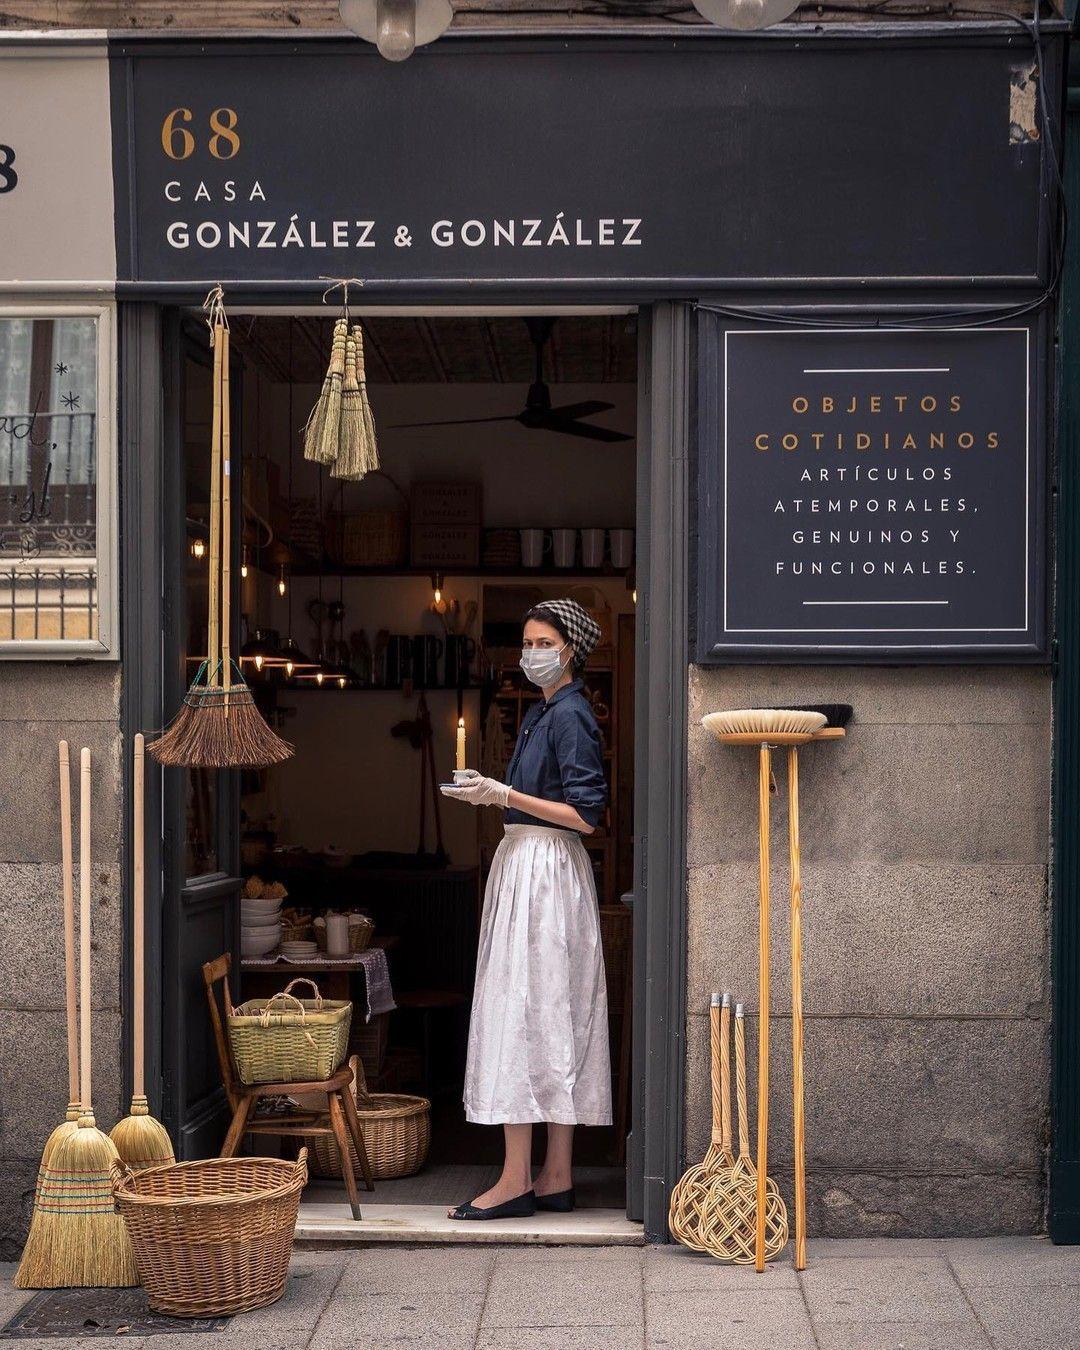 Casa González González Madrid Gonzalezygonzalezstore A Beautifully Poignant Reminder Of Our New Normal Sharingaworldofsho Shop Interiors Facade Store Front